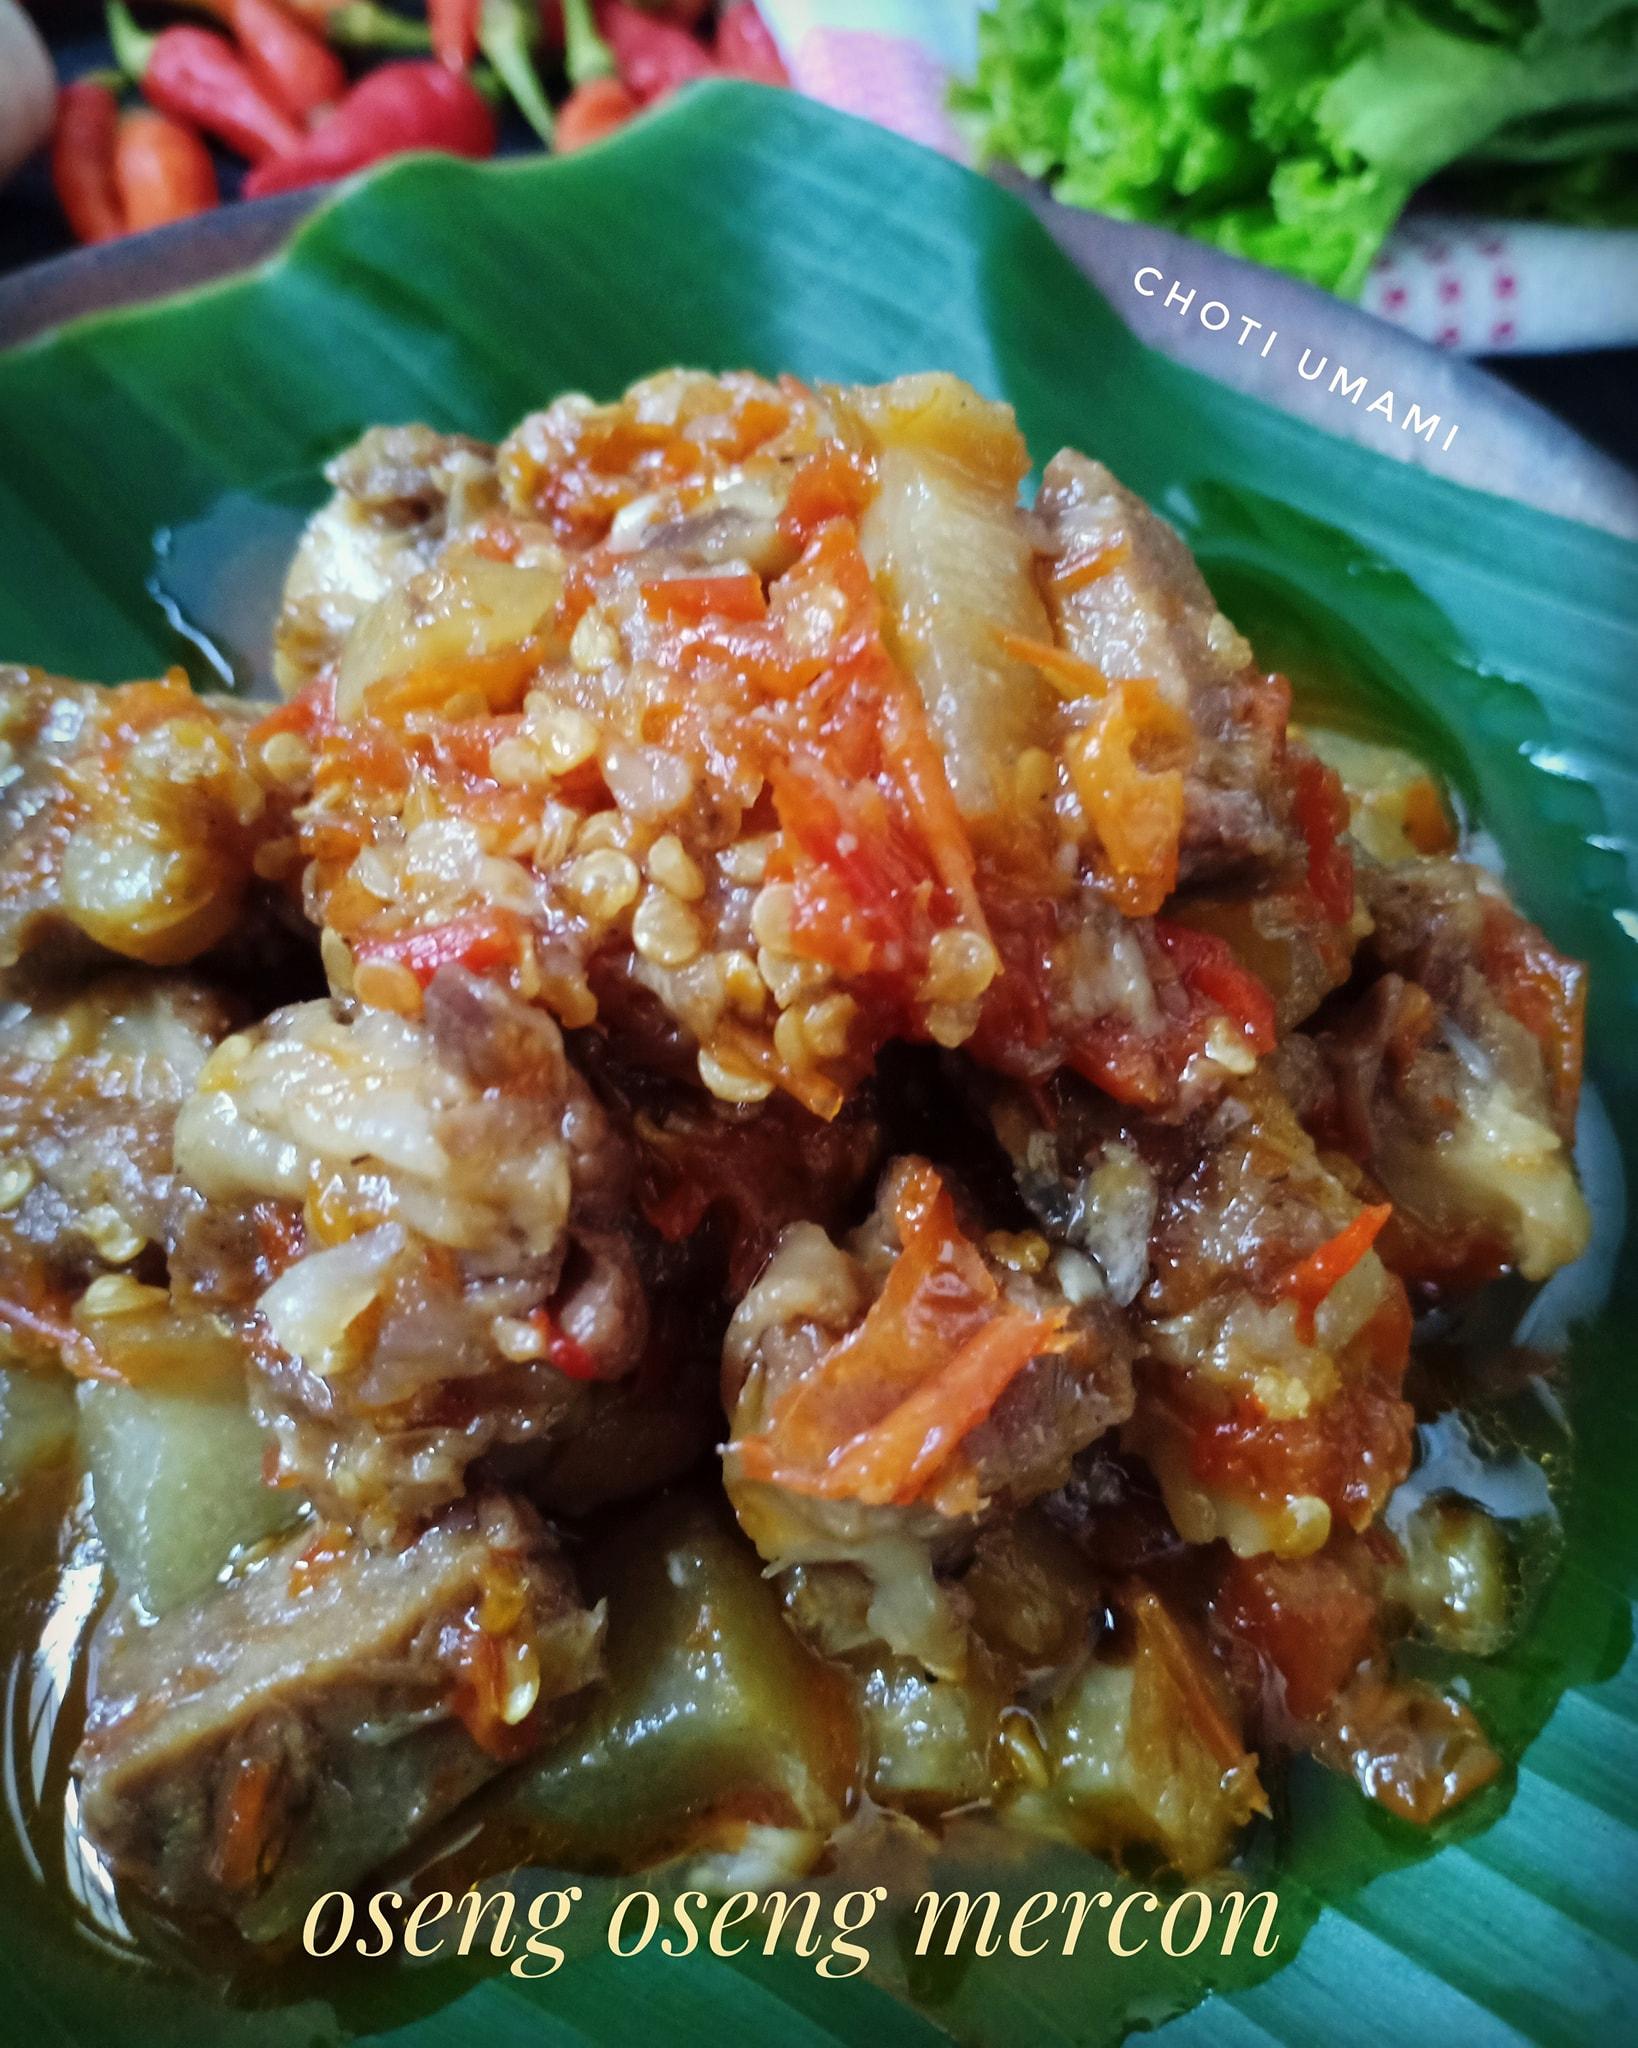 oseng oseng mercon by Choti Umami